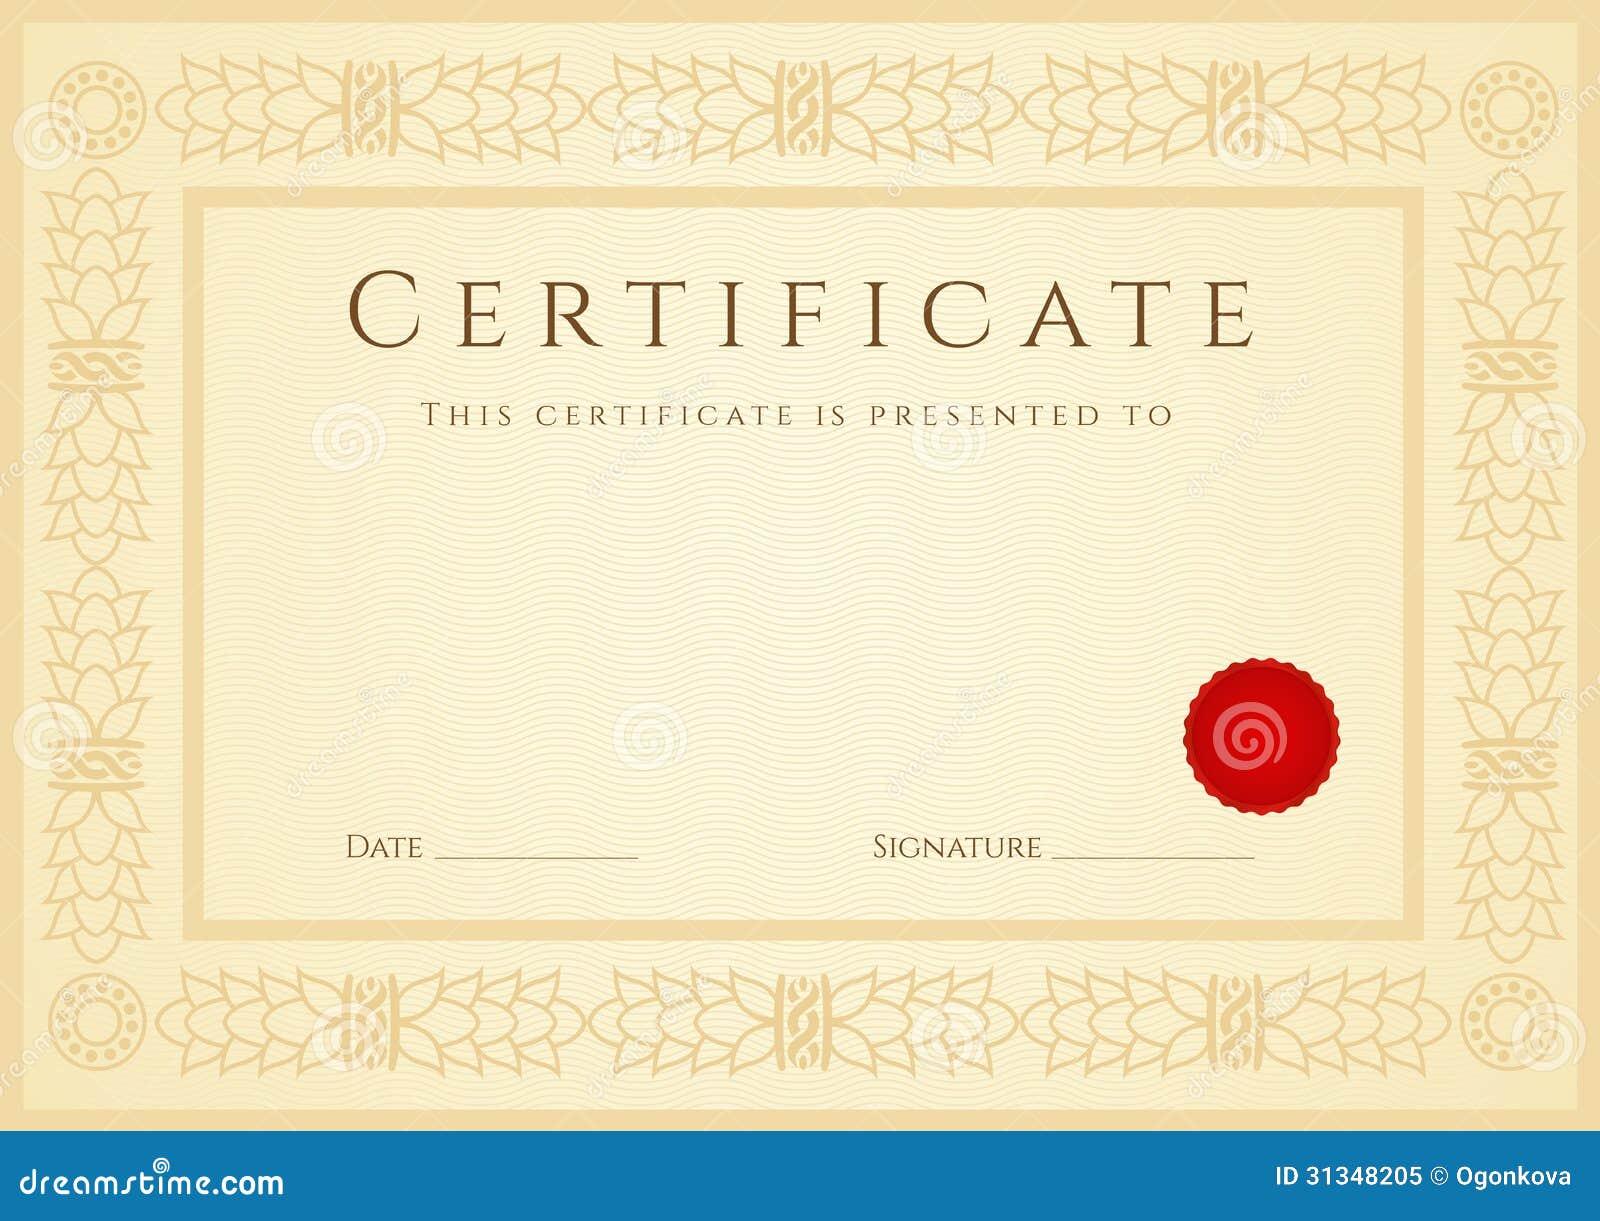 Sports certificate template 2979181 detektiv007fo sports certificate template alramifo Image collections